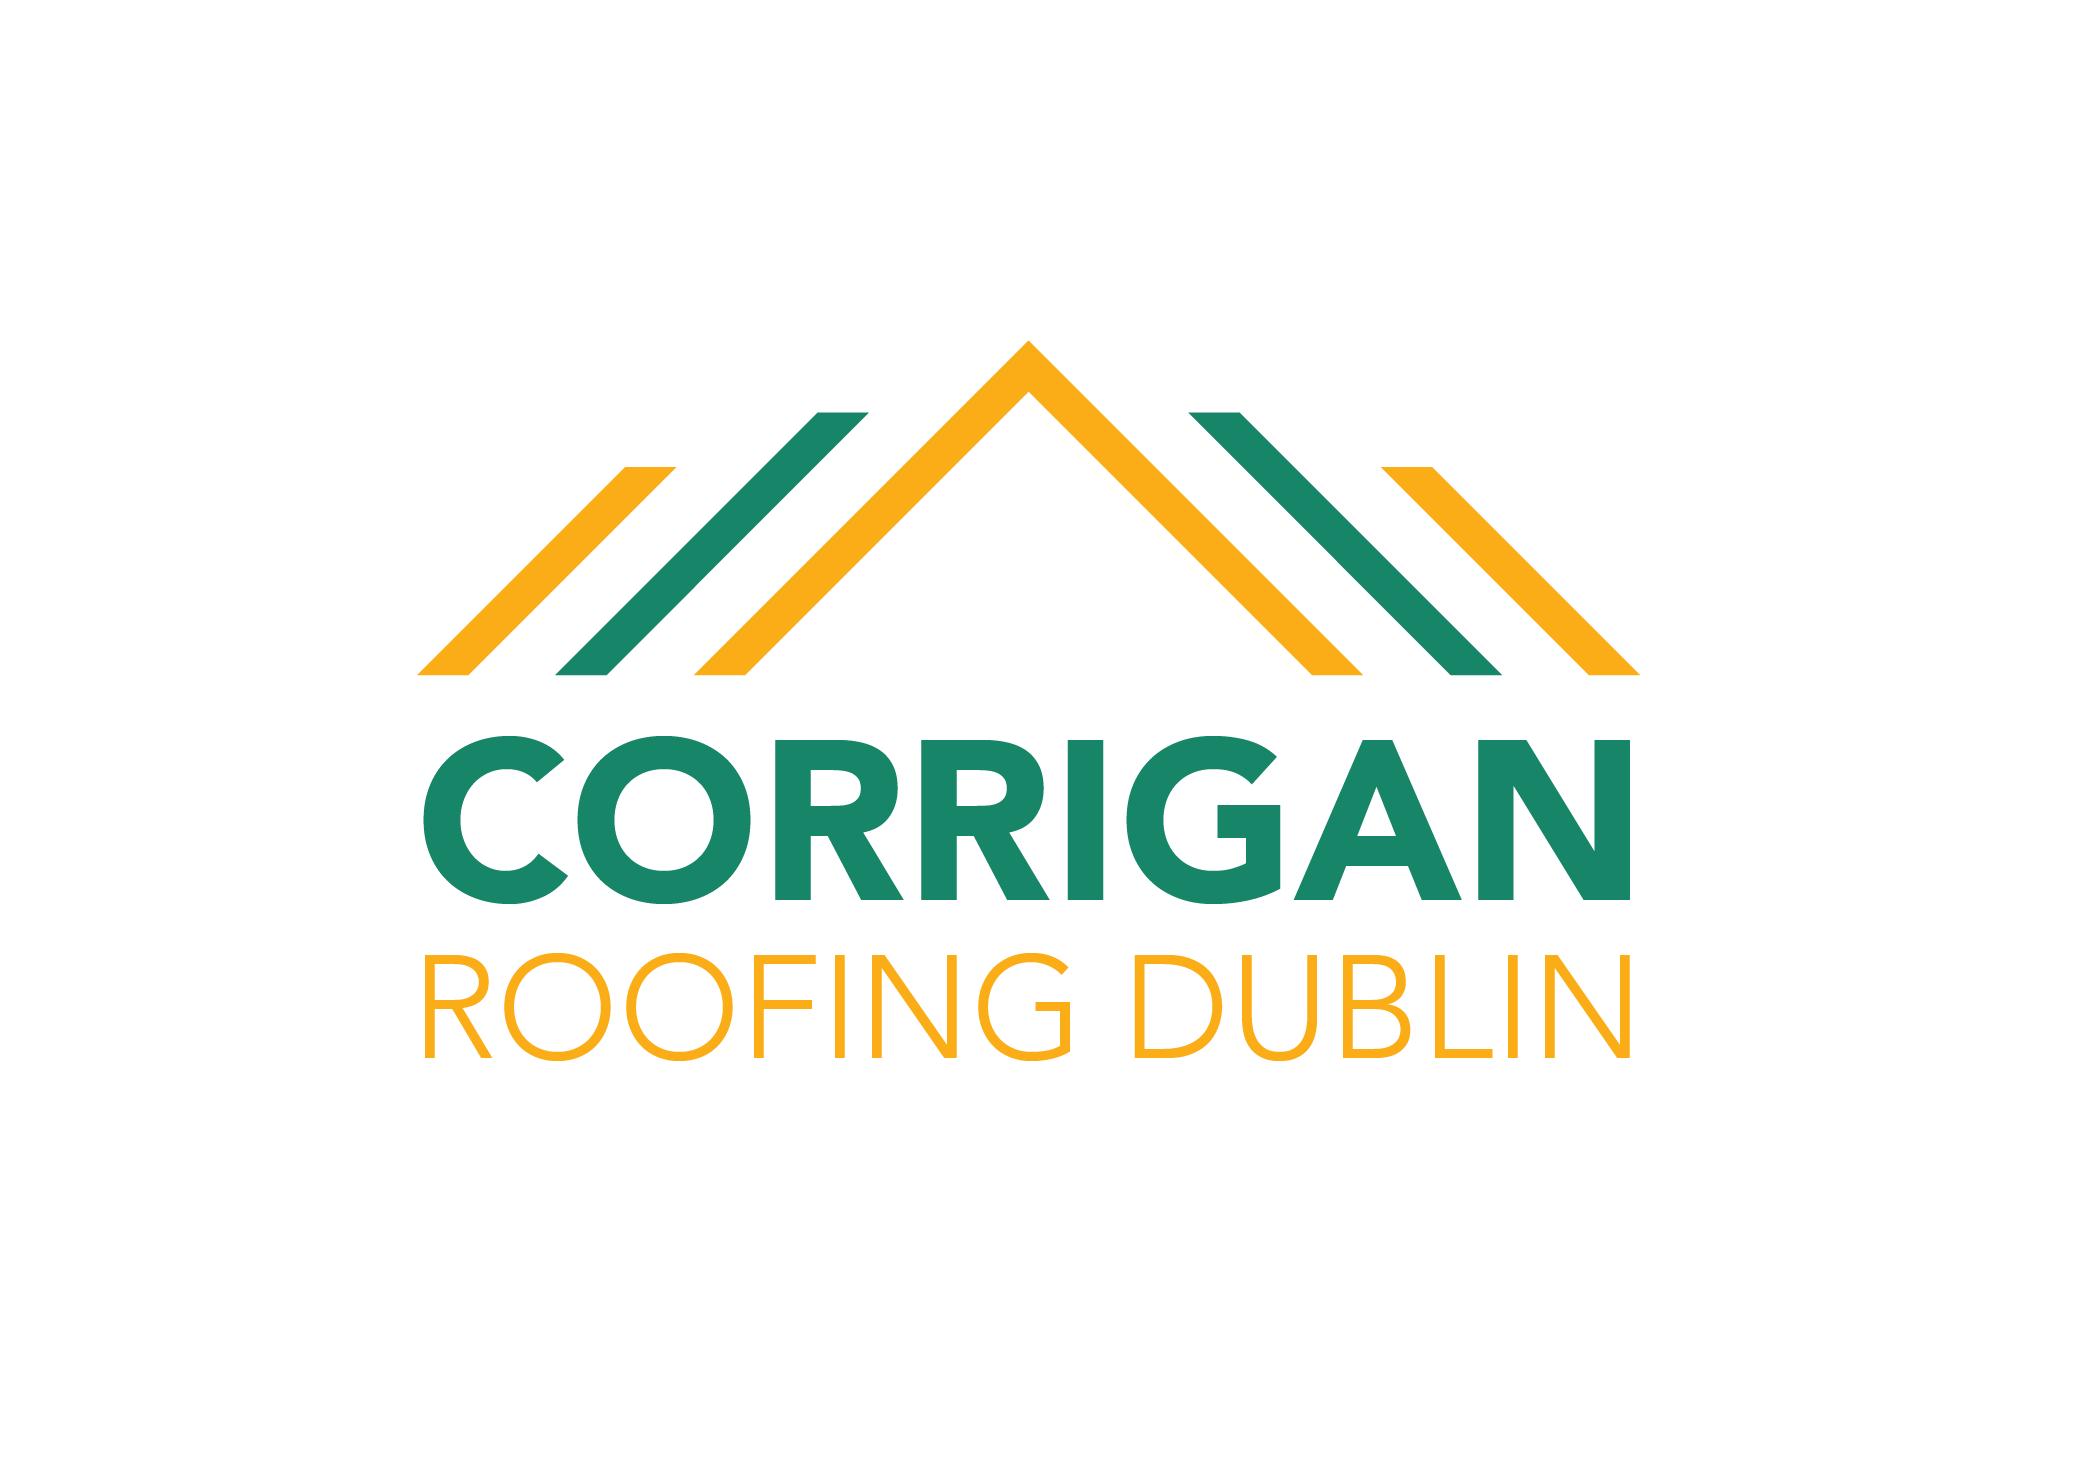 Corrigan Roofing Dublin Logo